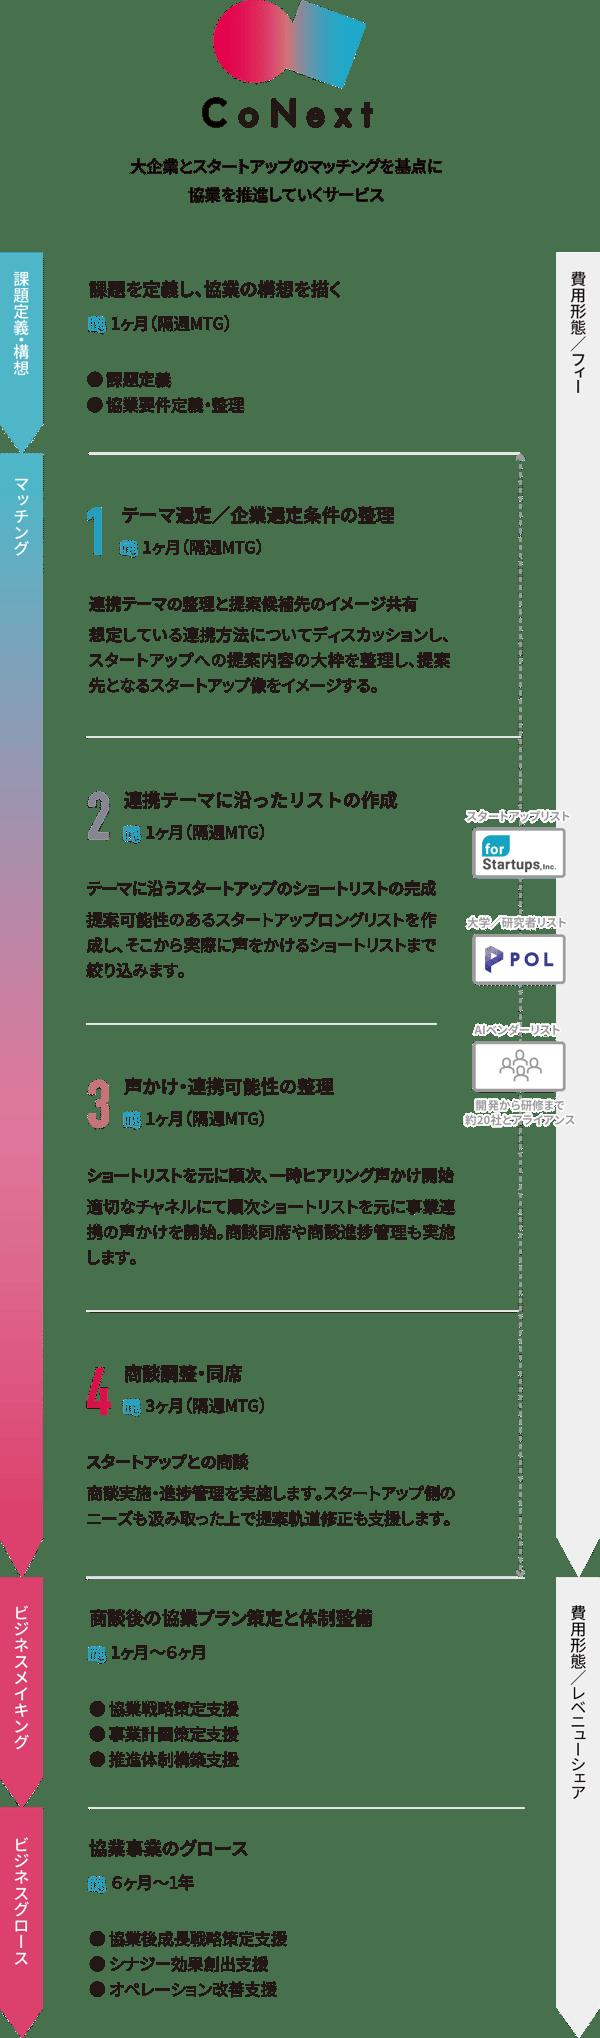 CoNext 大企業とスタートアップのマッチングを基点に協業を推進していくサービス